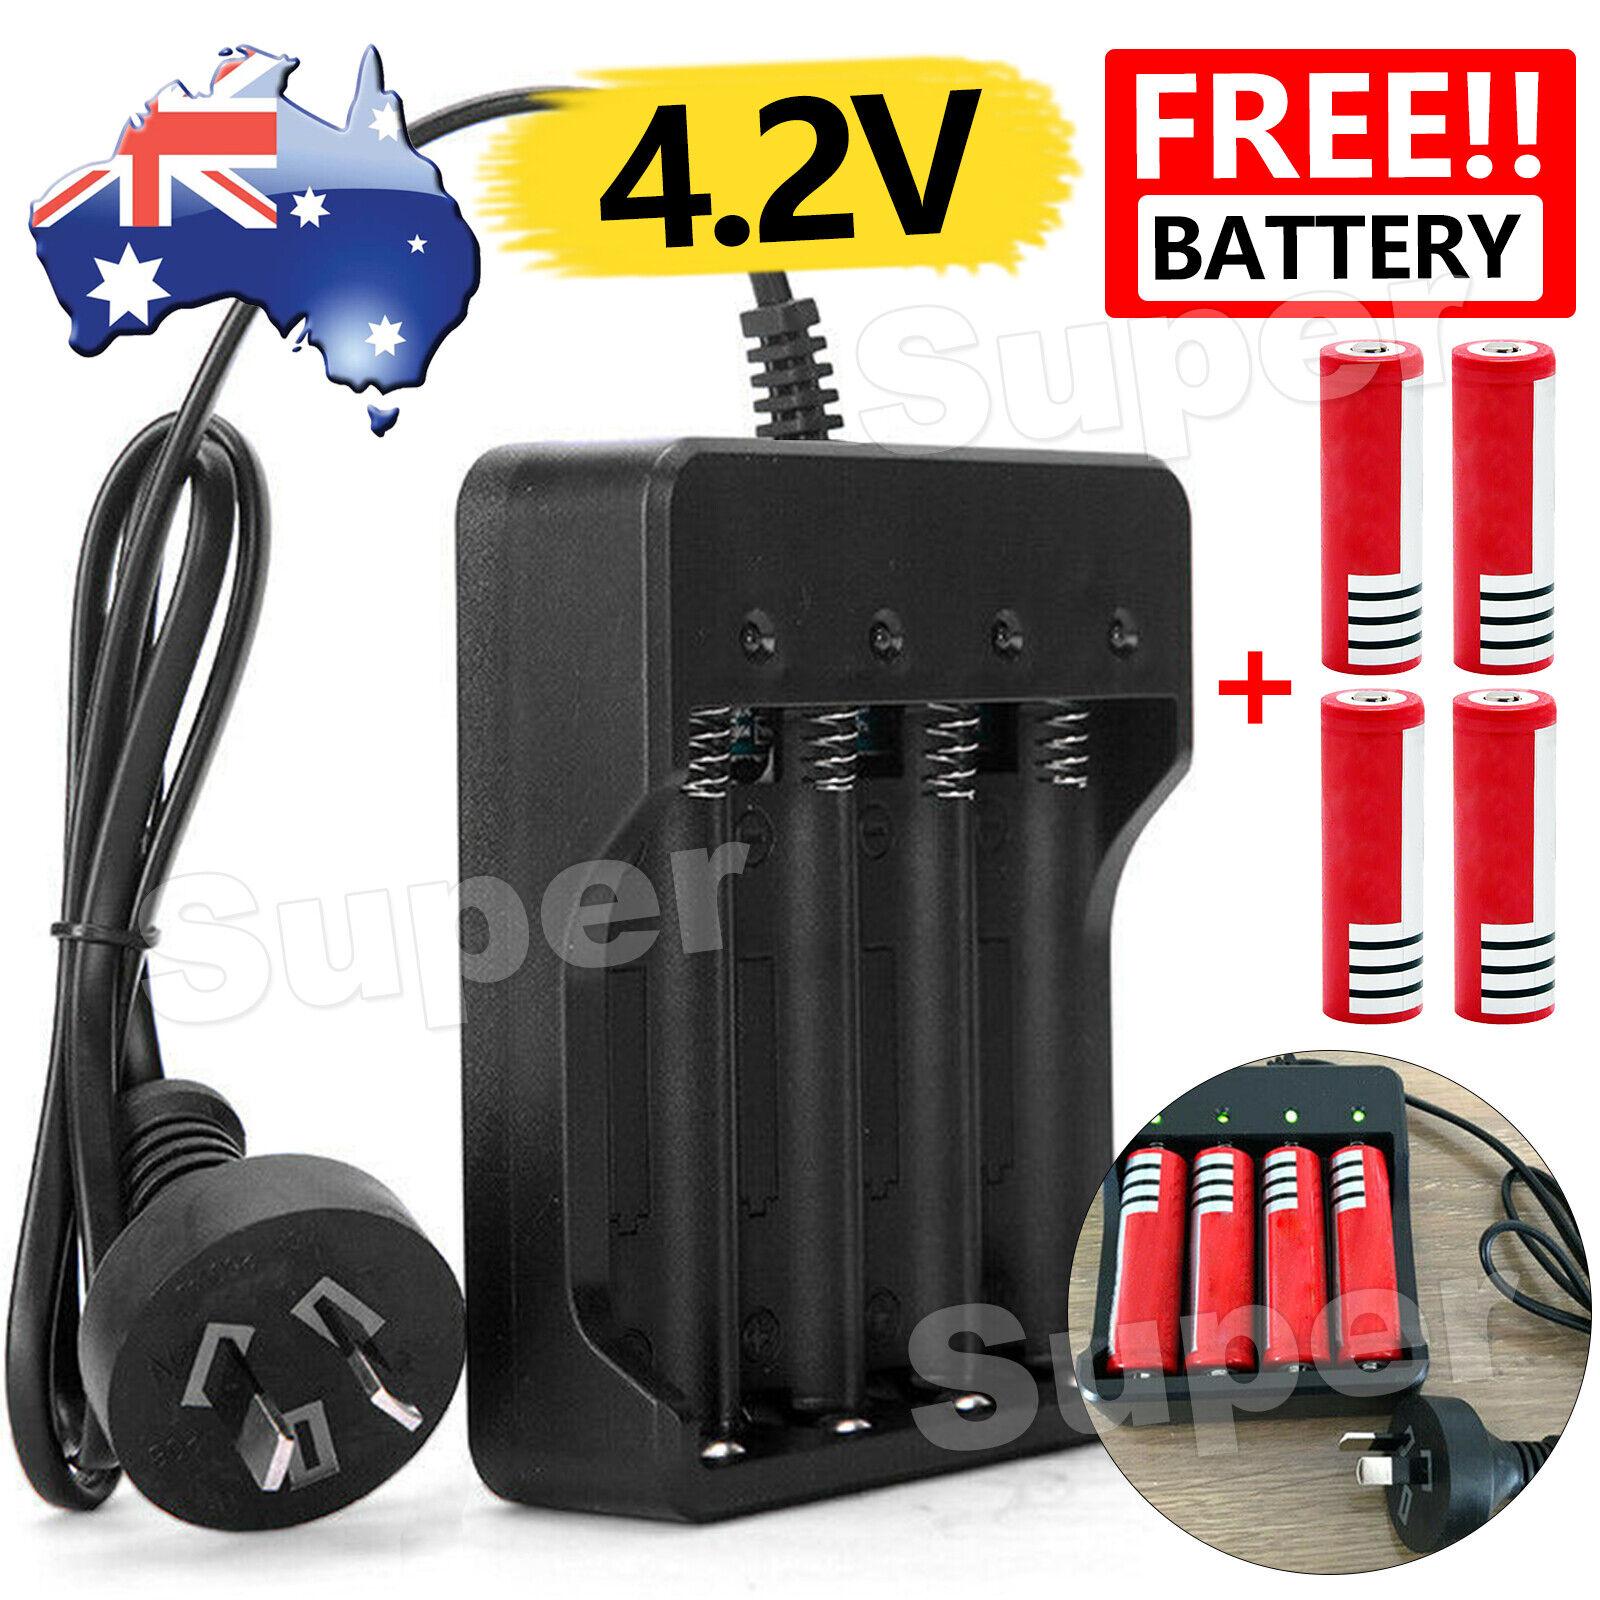 Universal 4 Slots 4.2V Rechargeable Li-ion Battery Smart Charger PLUS AU